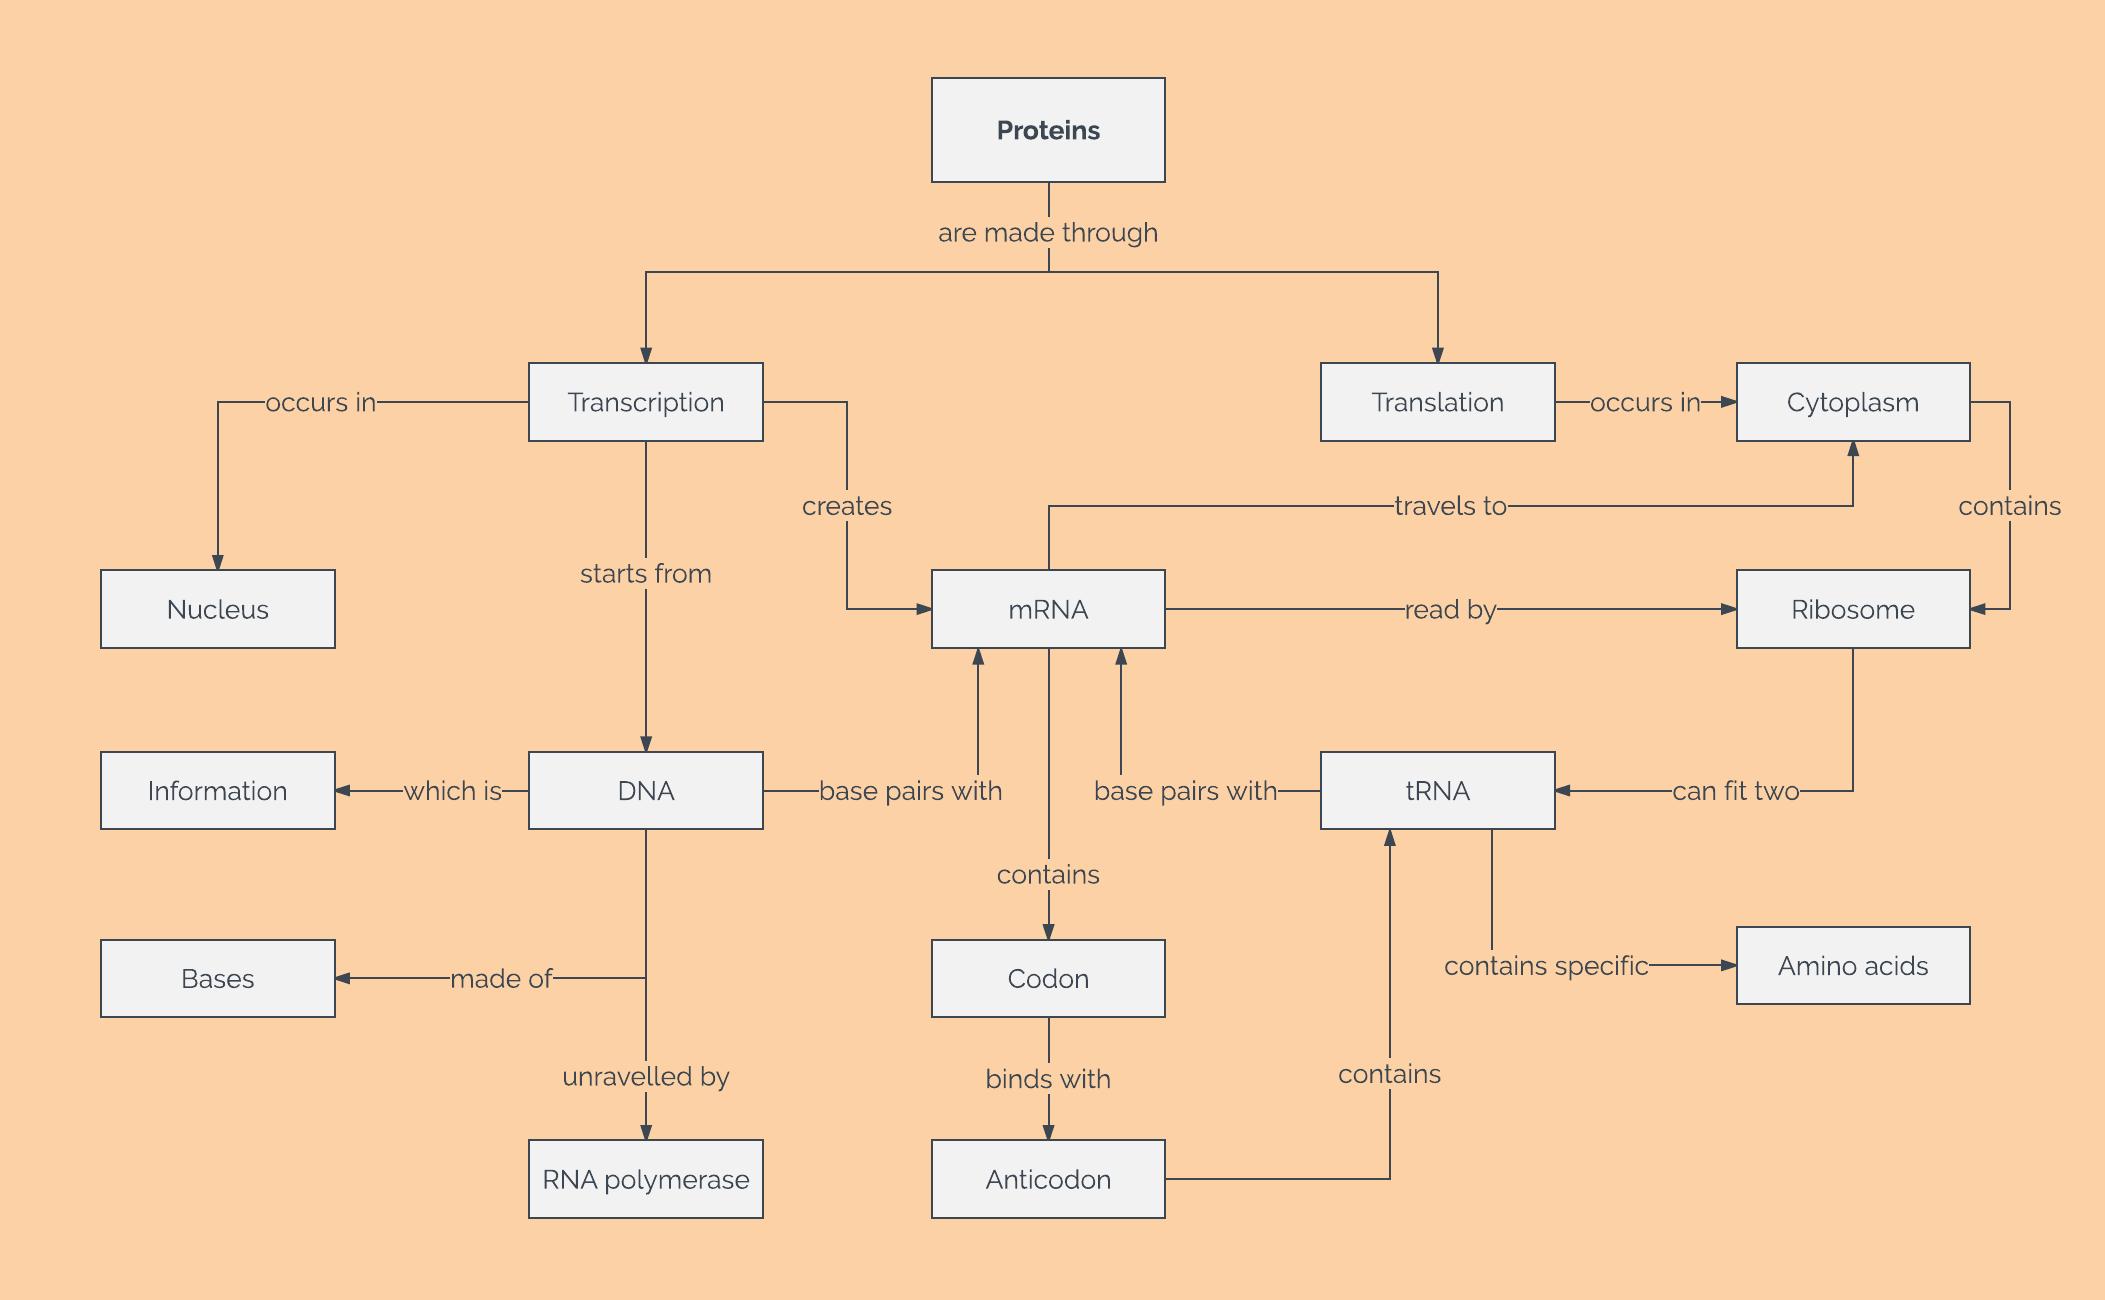 cellular respiration diagram worksheet 1971 honda cb450 wiring how to make a concept map in word | lucidchart blog